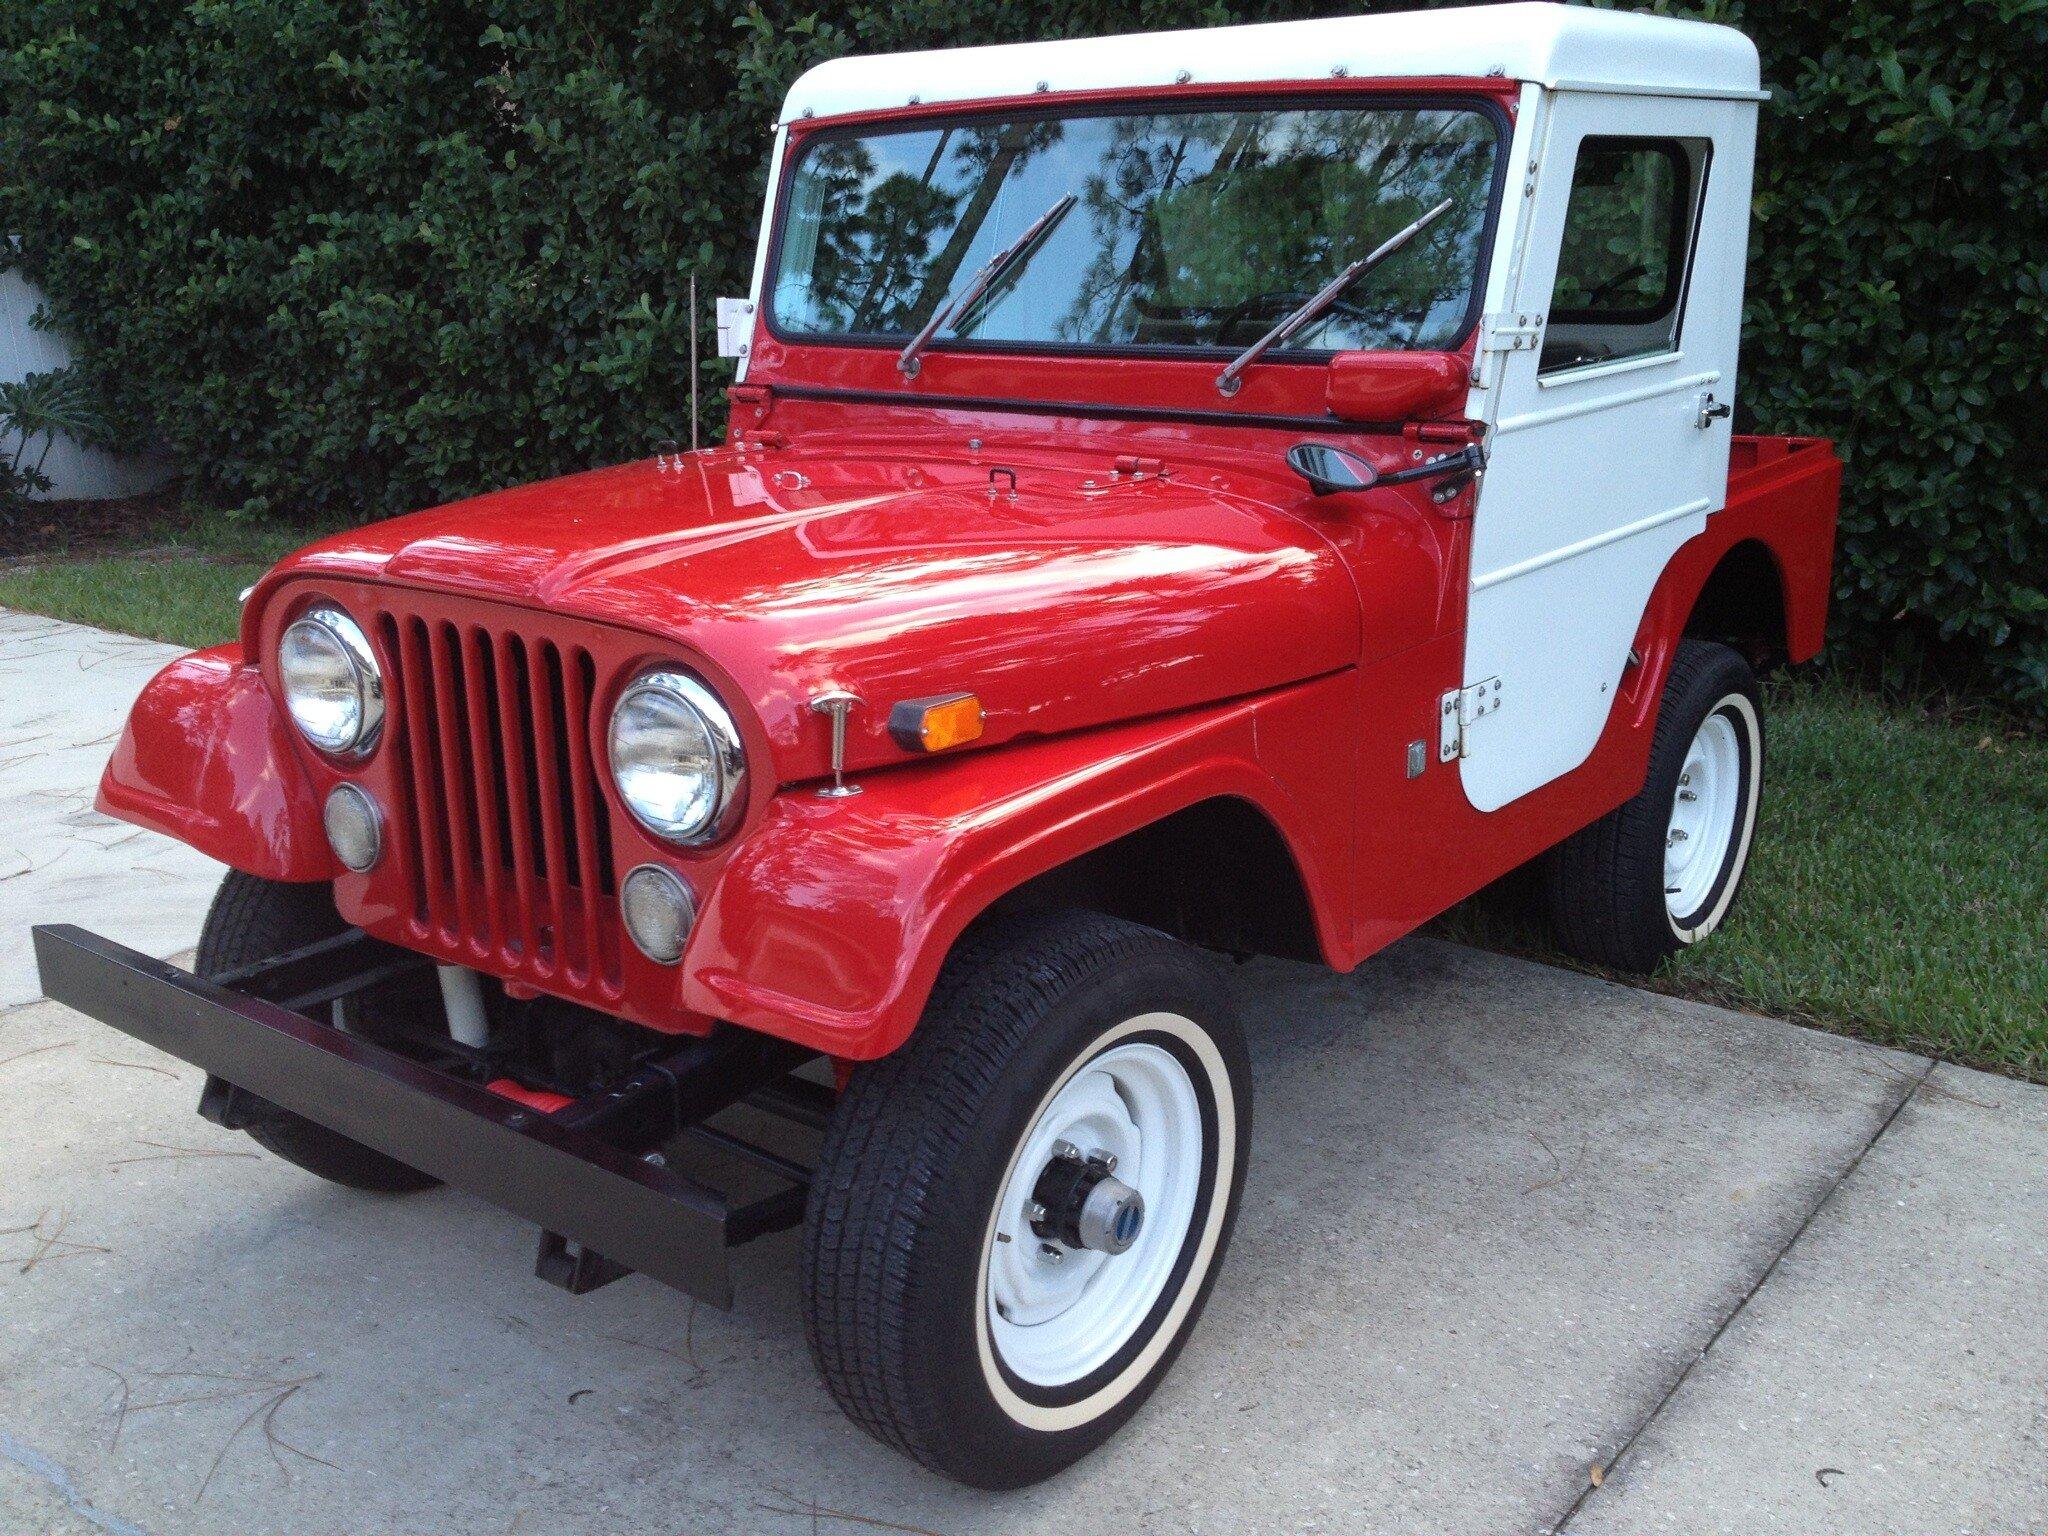 jeep cj 5 classics for sale classics on autotrader CJ5 Dauntless V6